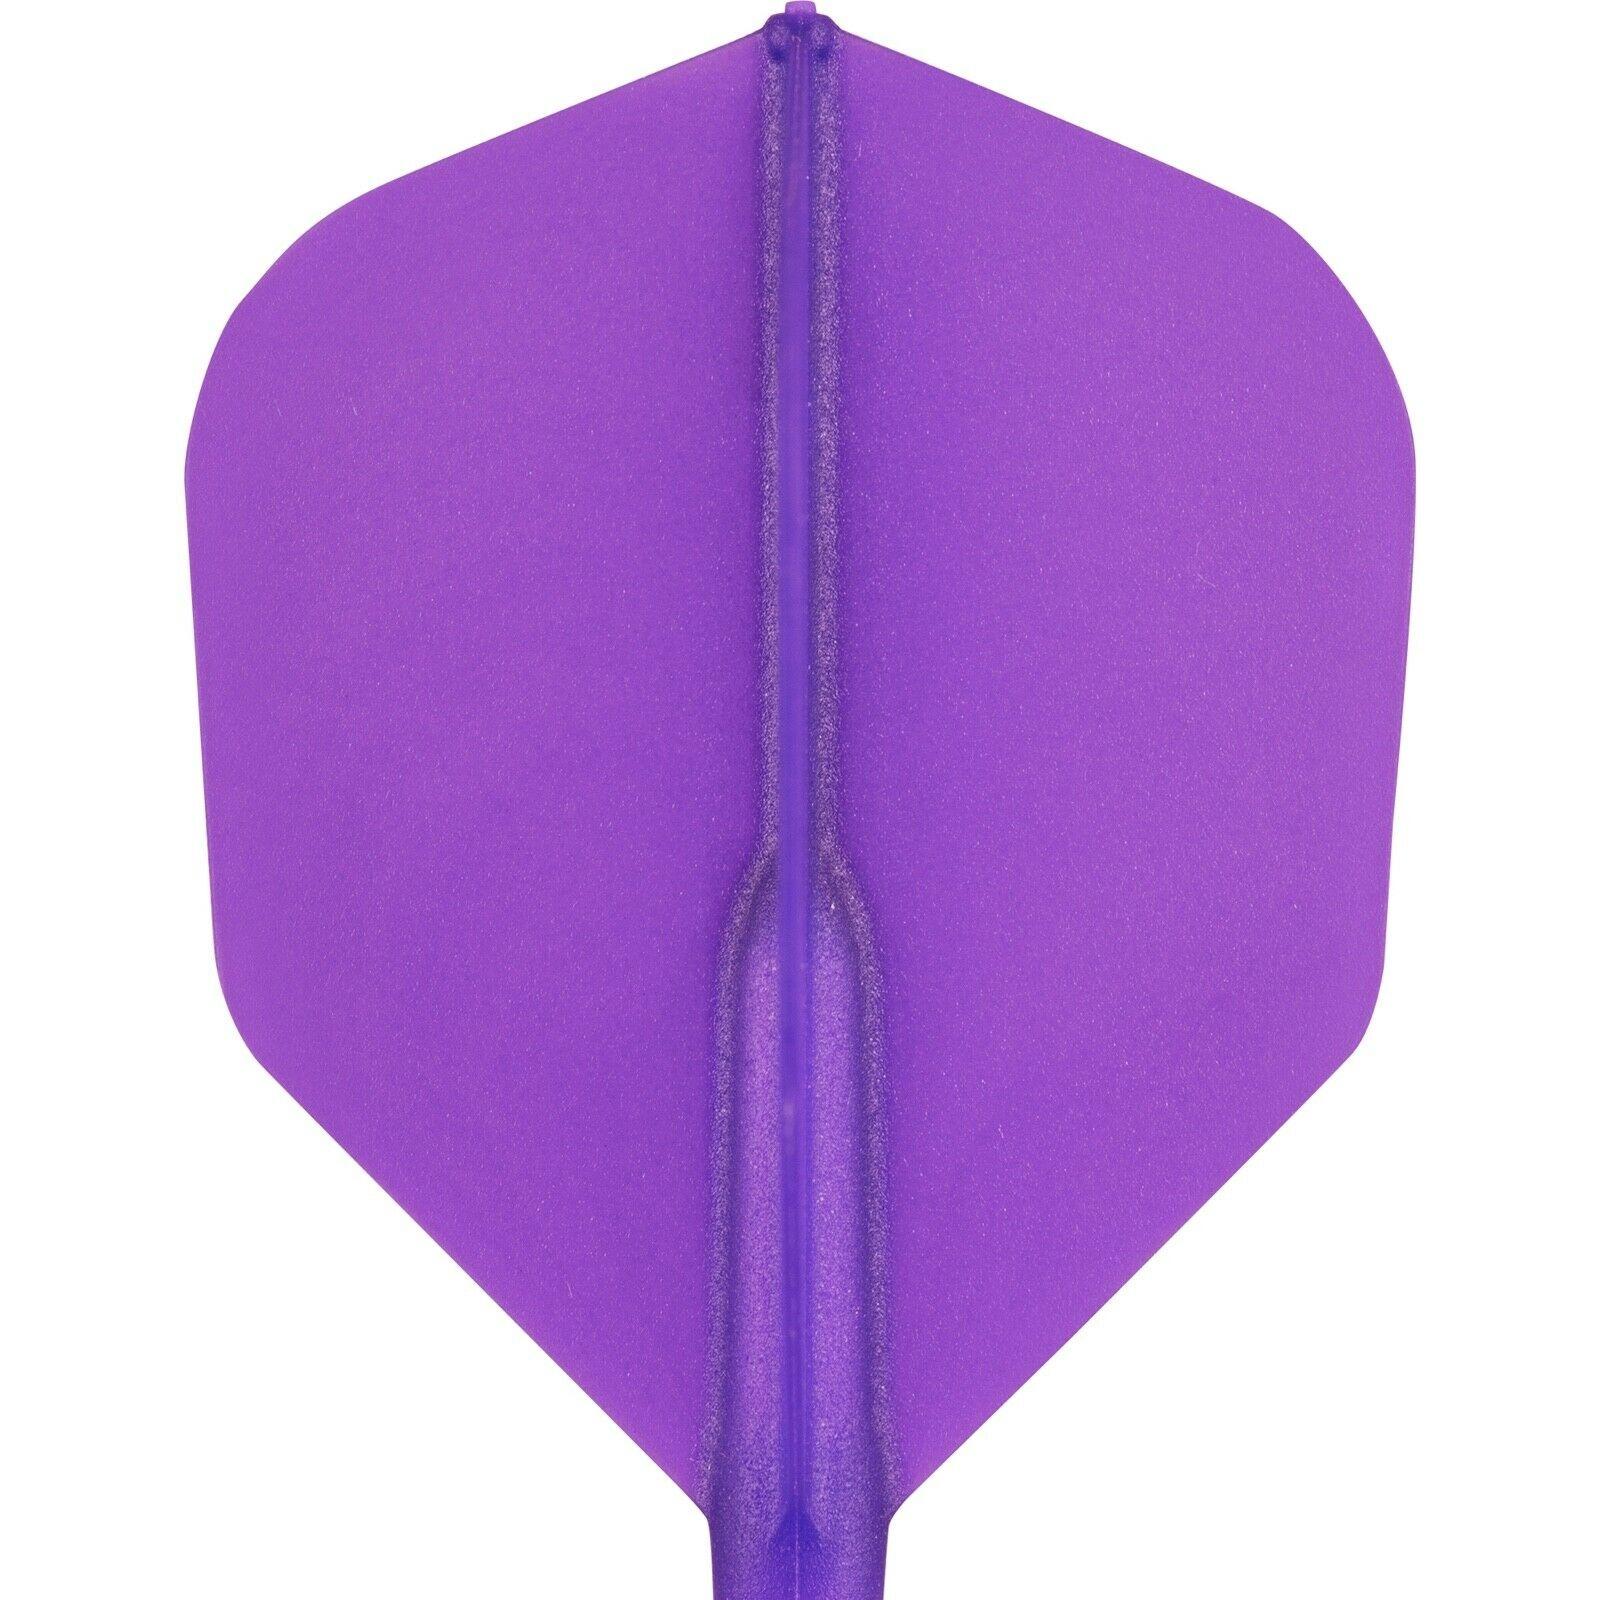 Cosmo Darts - Fit Flight Purple Shape